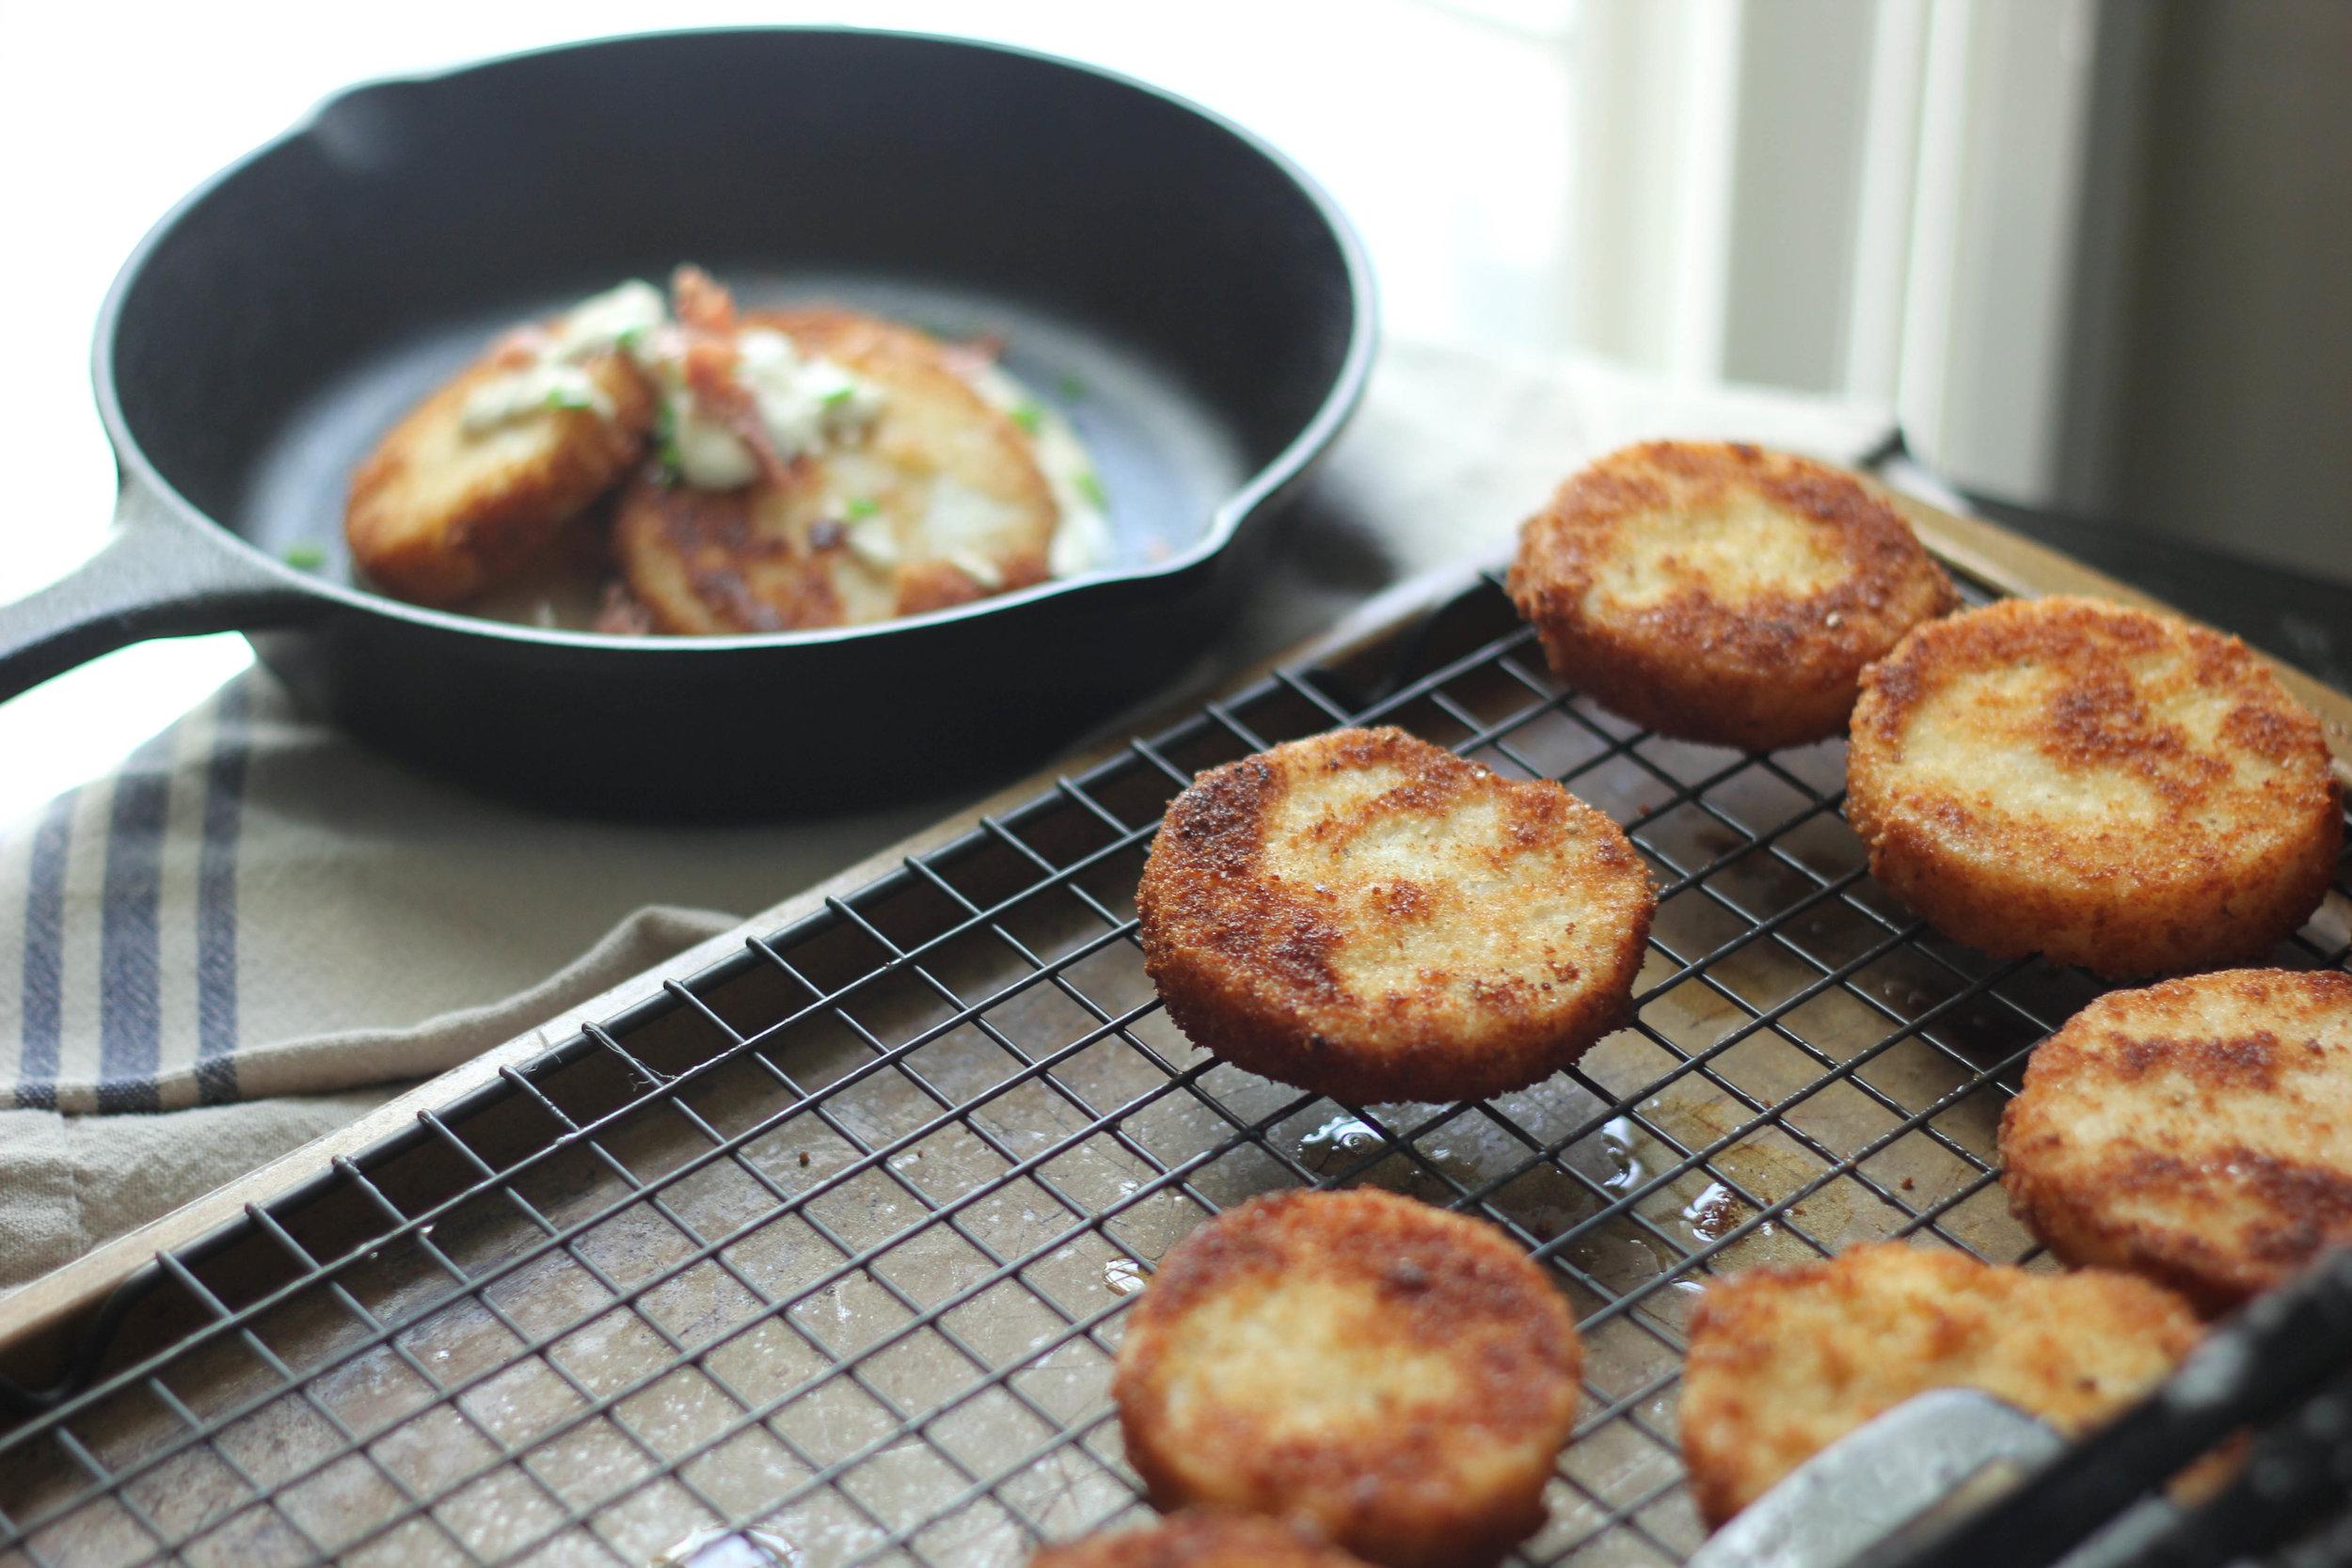 Fried Grits & Black Pepper Soubise 3 (1 of 1).jpg